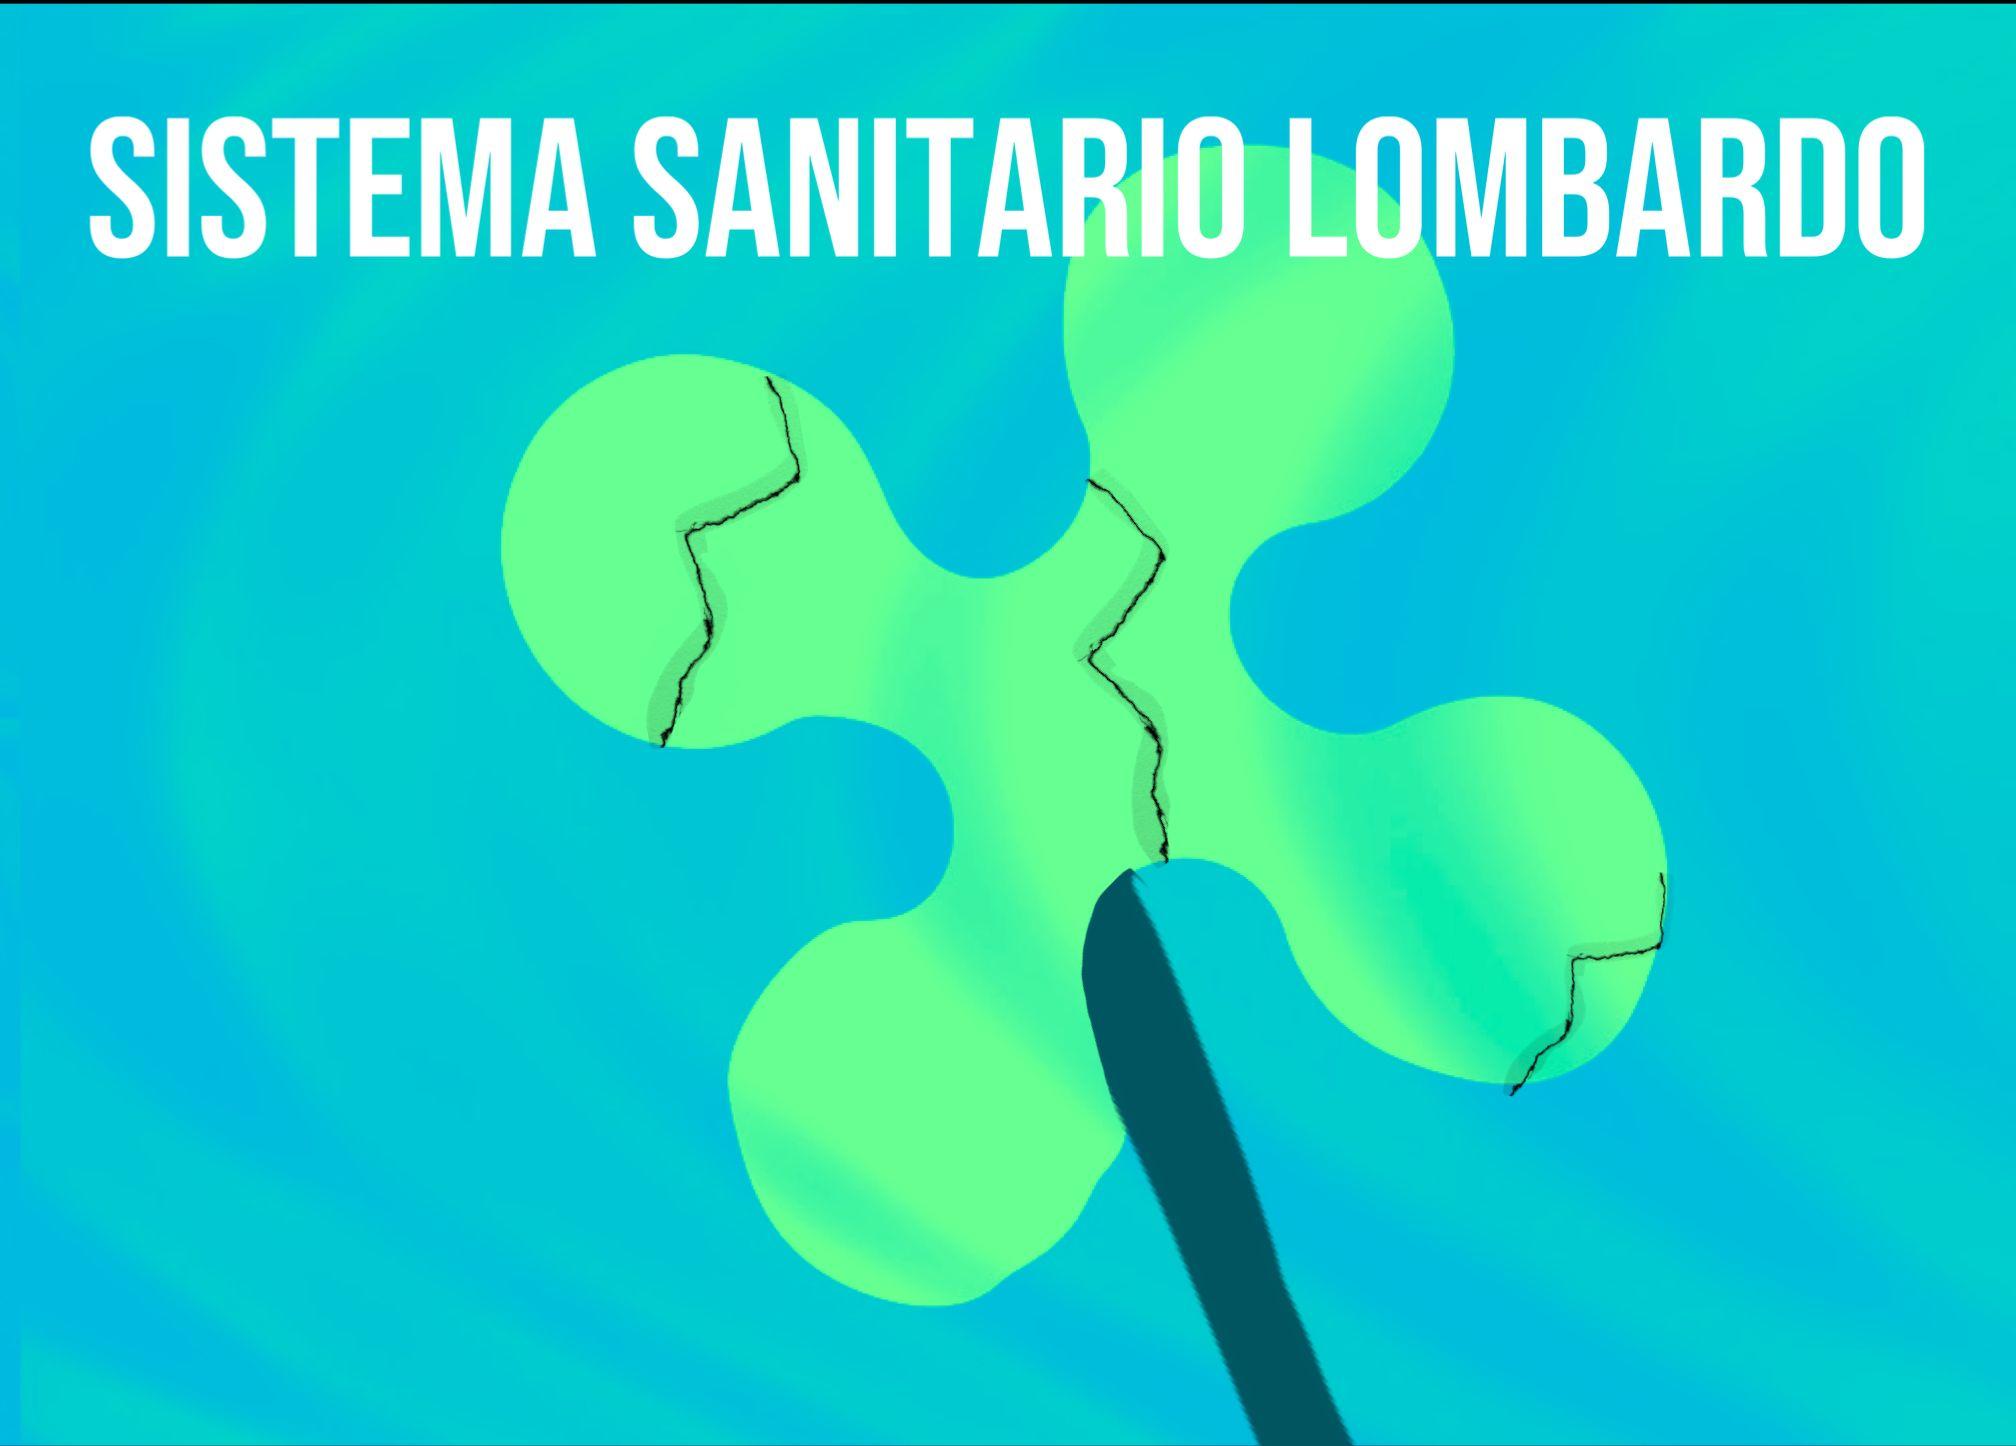 Un virus logora la Sanità Lombarda